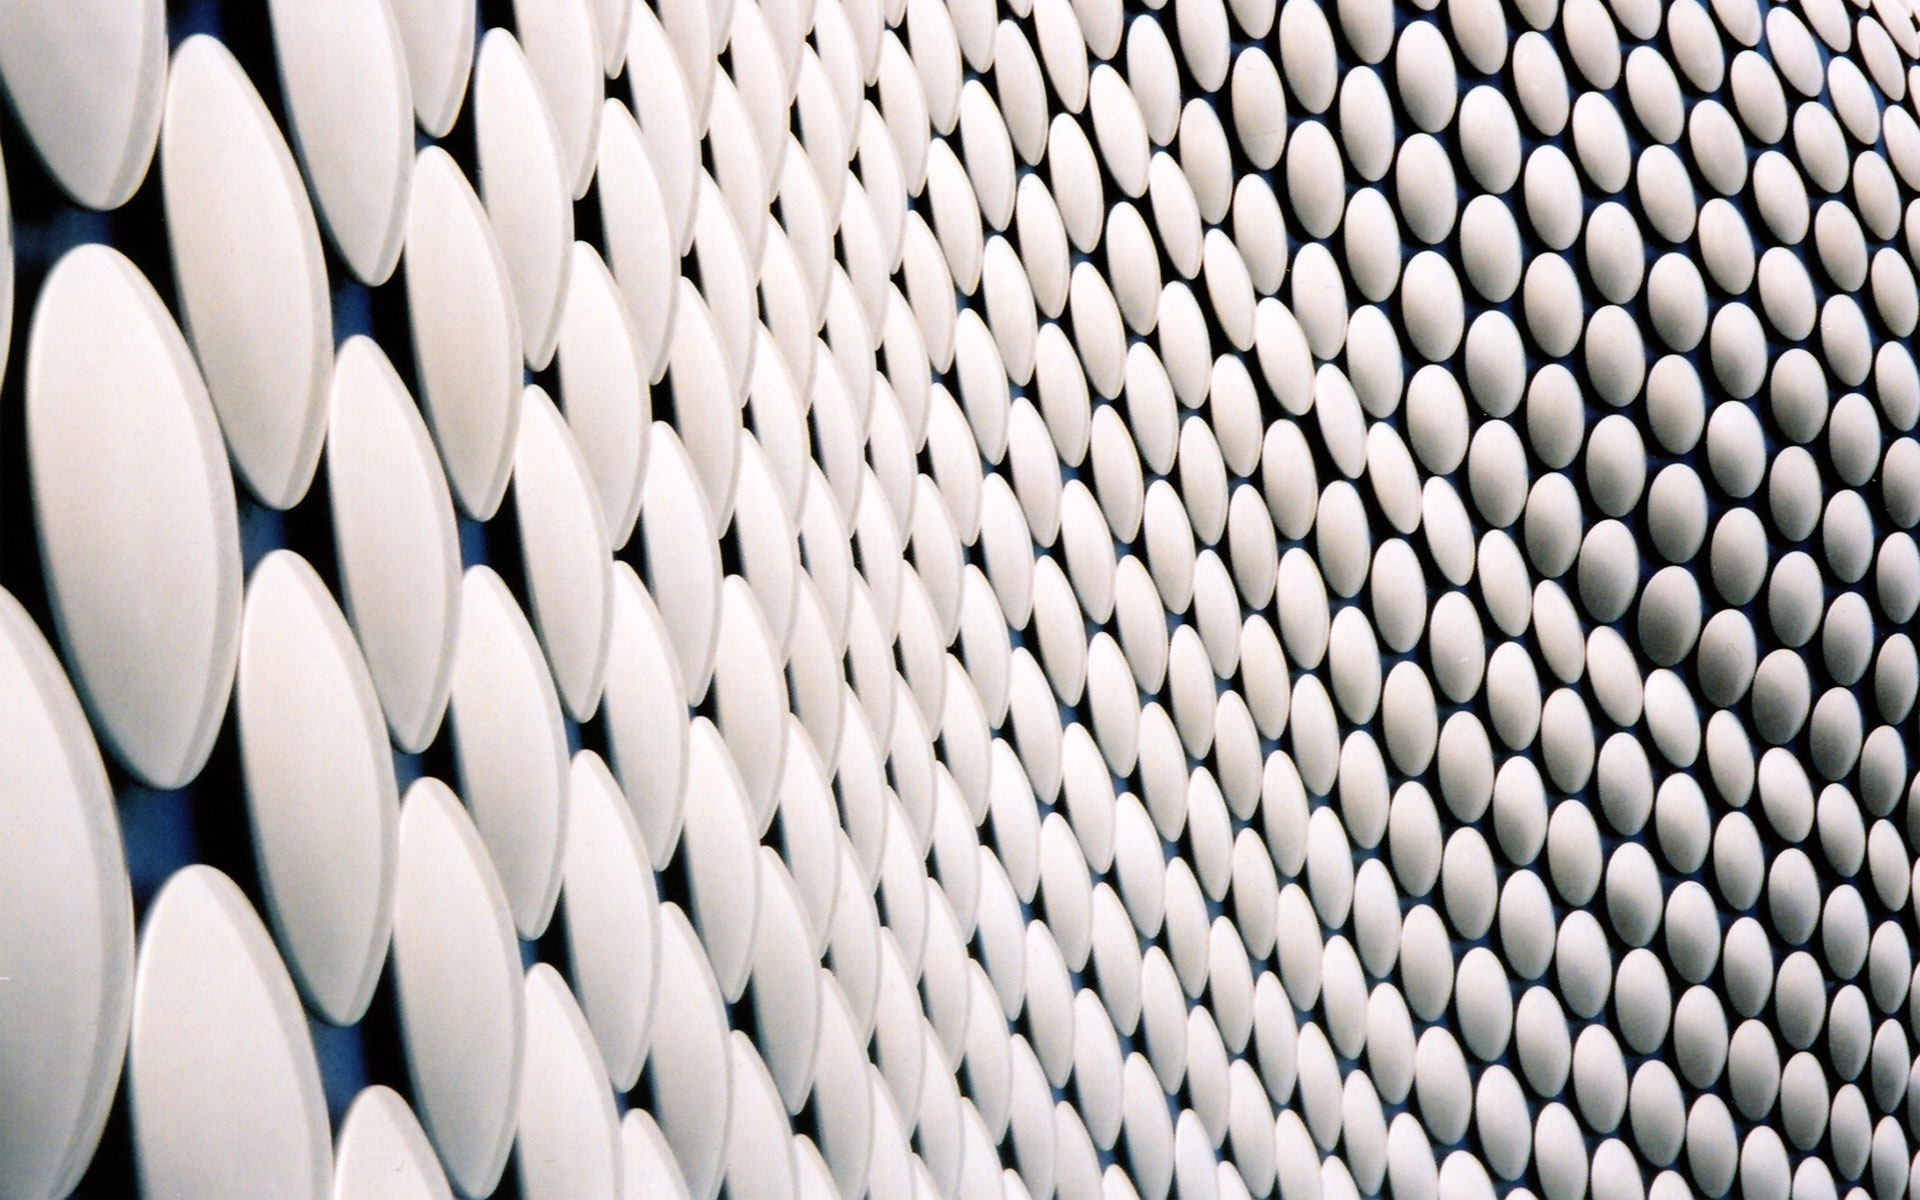 Hd wallpaper white - White Bubbles Widescreen Wallpapers Hd Wallpapers